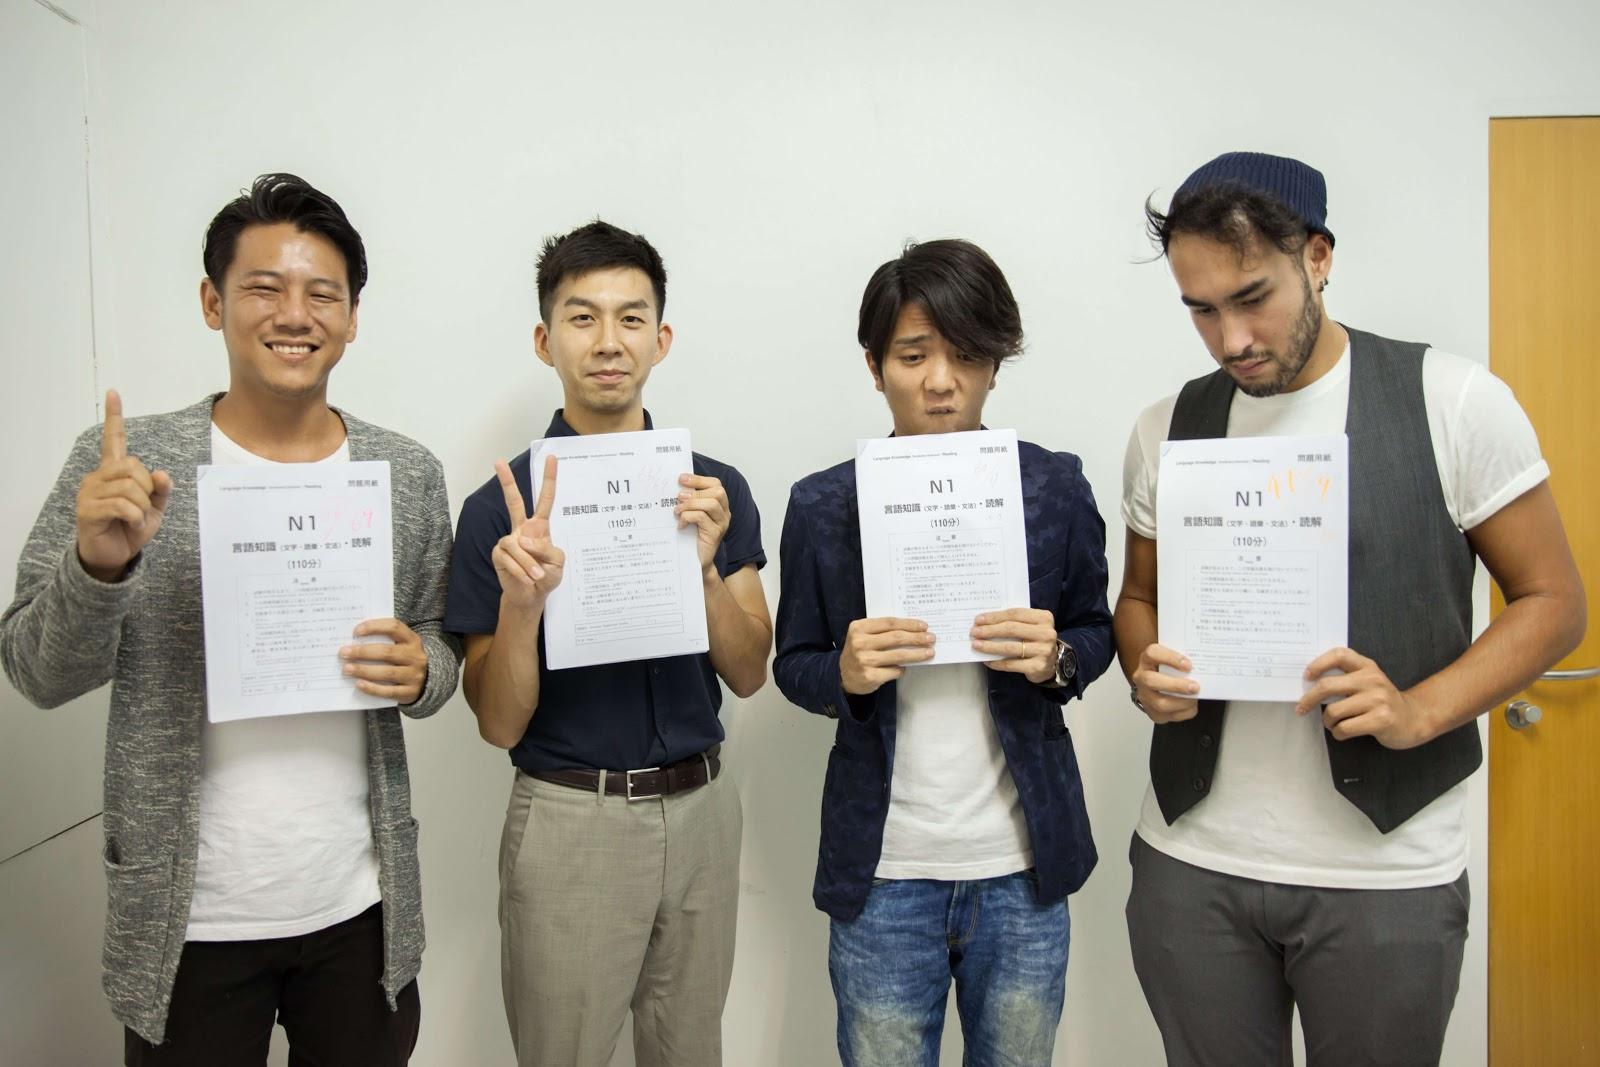 DTK AD 日本人社員 jlpt